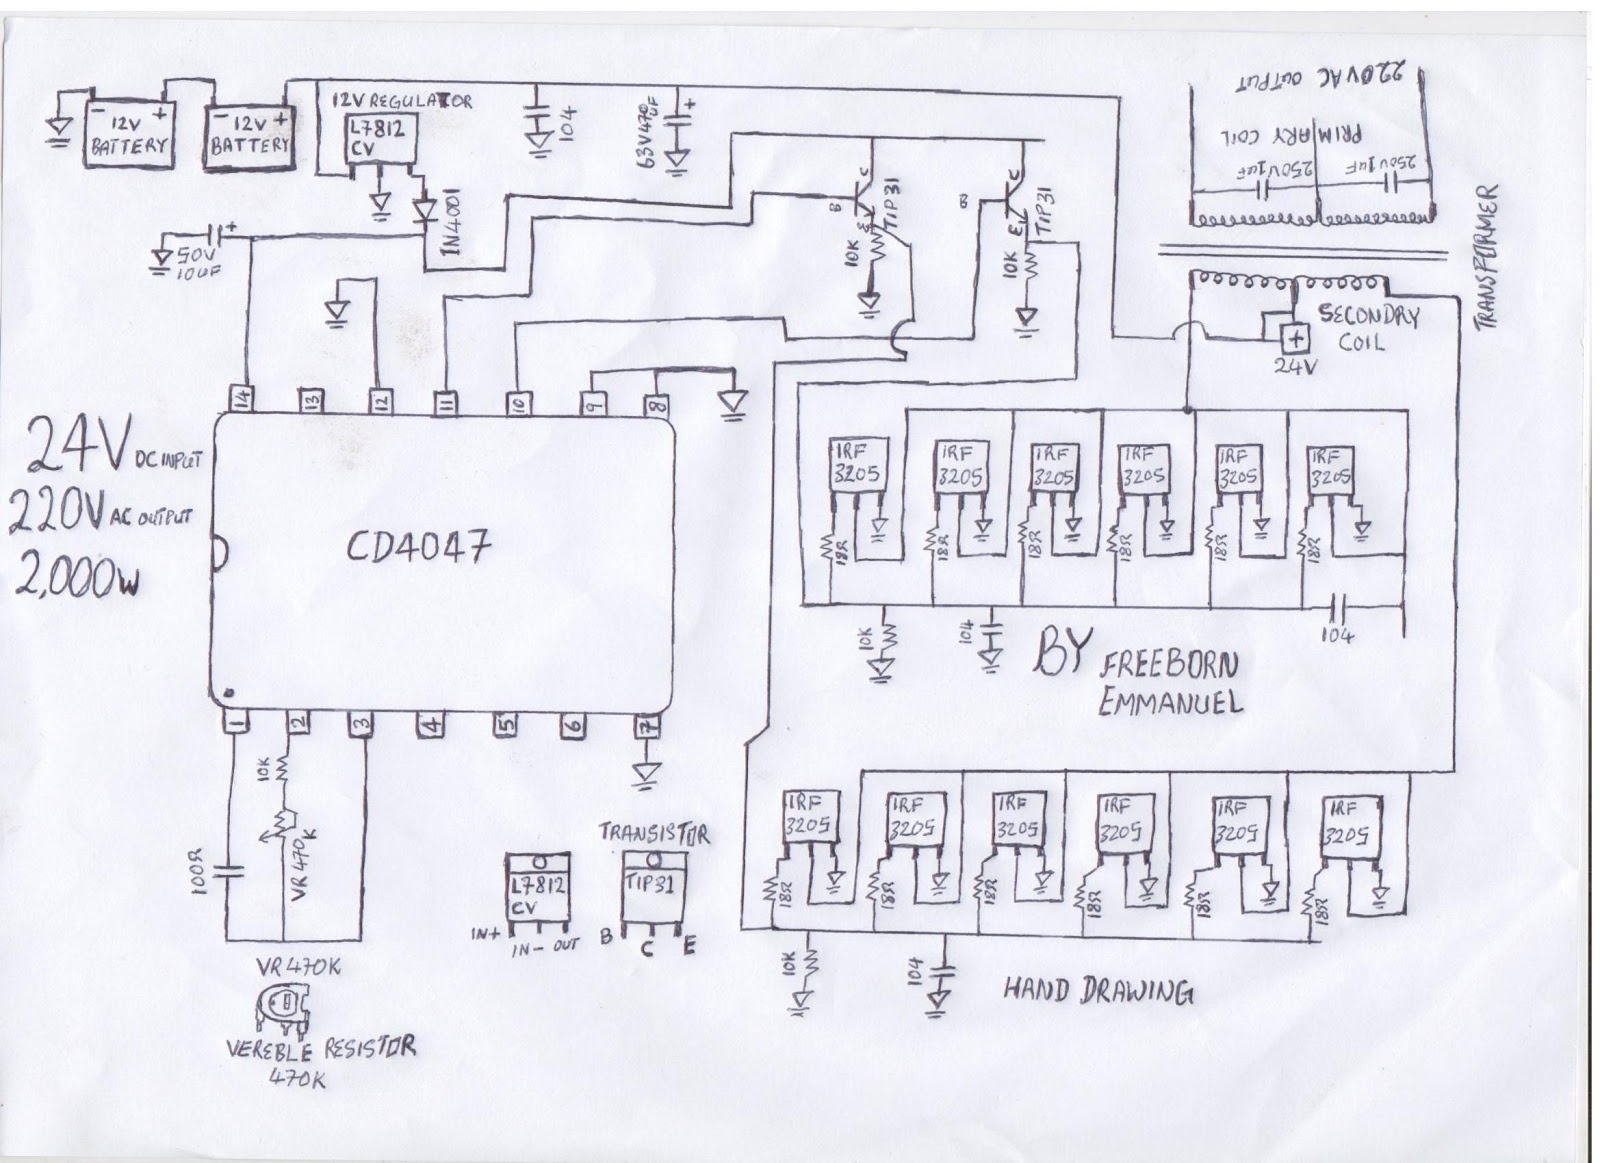 medium resolution of 2000 watt inverter circuit diagram wiring diagram for you 2000w power inverter circuit diagram 2000w inverter wiring diagram